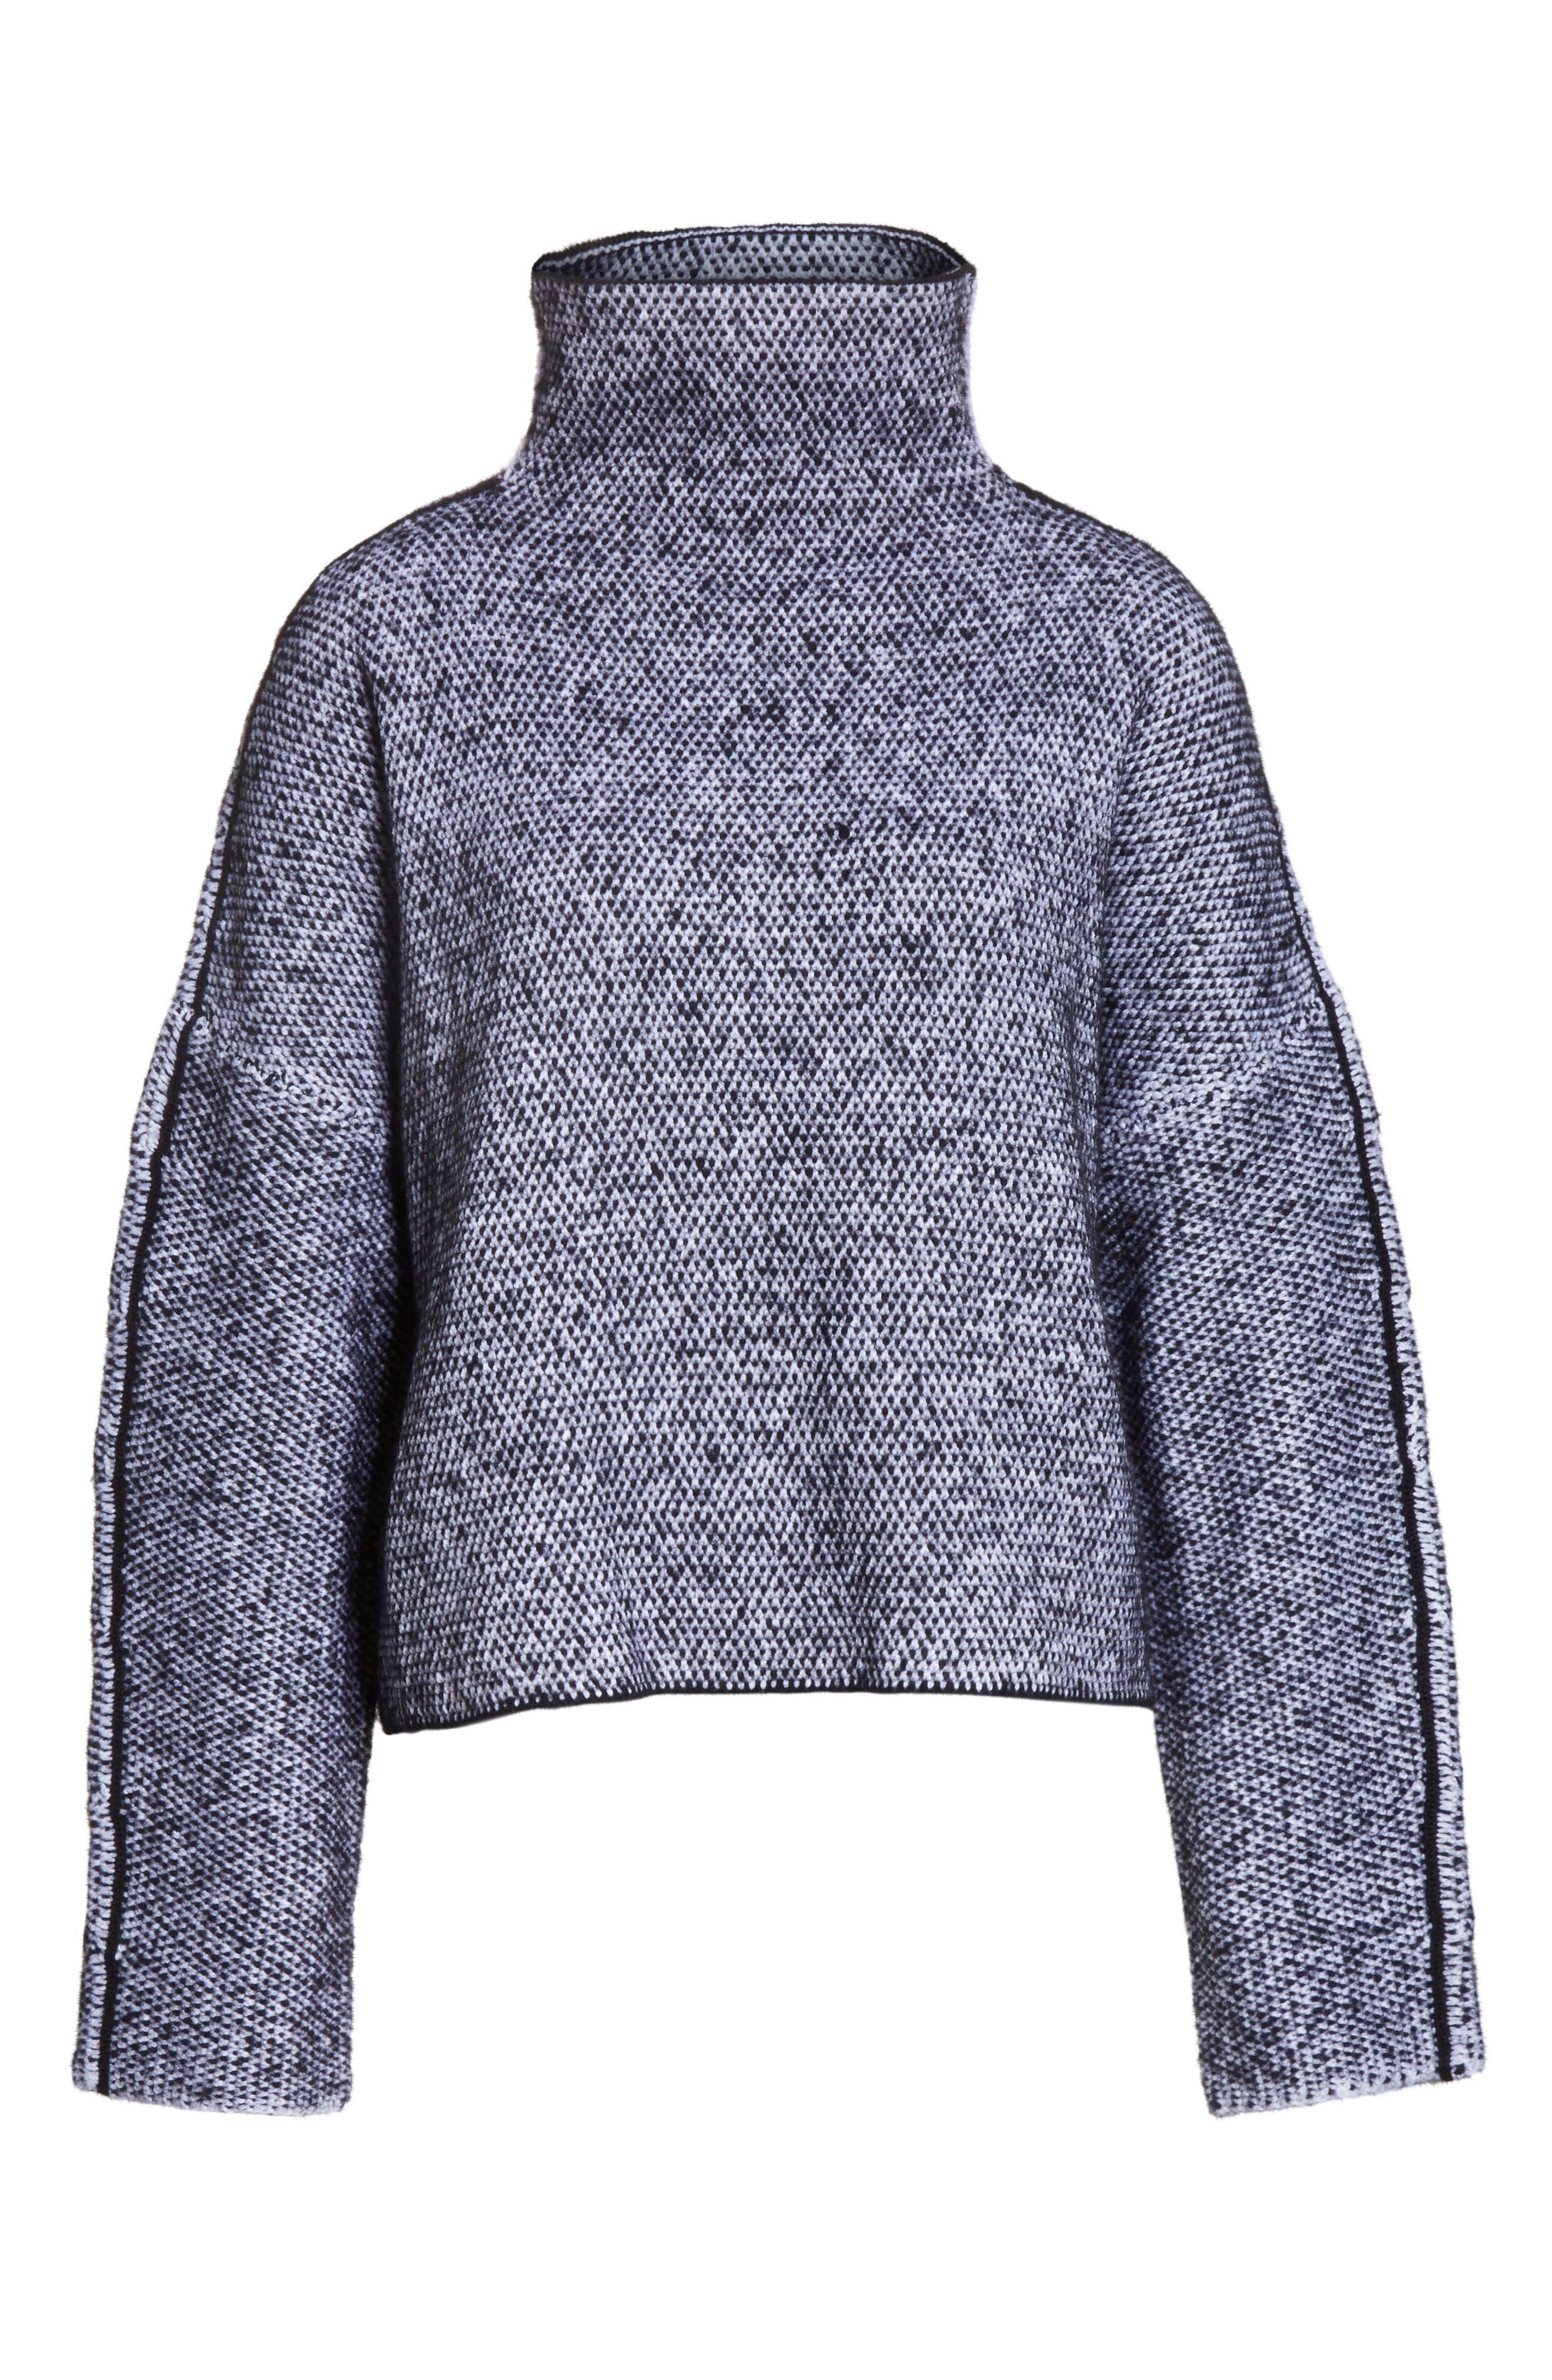 Robin Merino Wool Blend Sweater,                             Alternate thumbnail 6, color,                             001